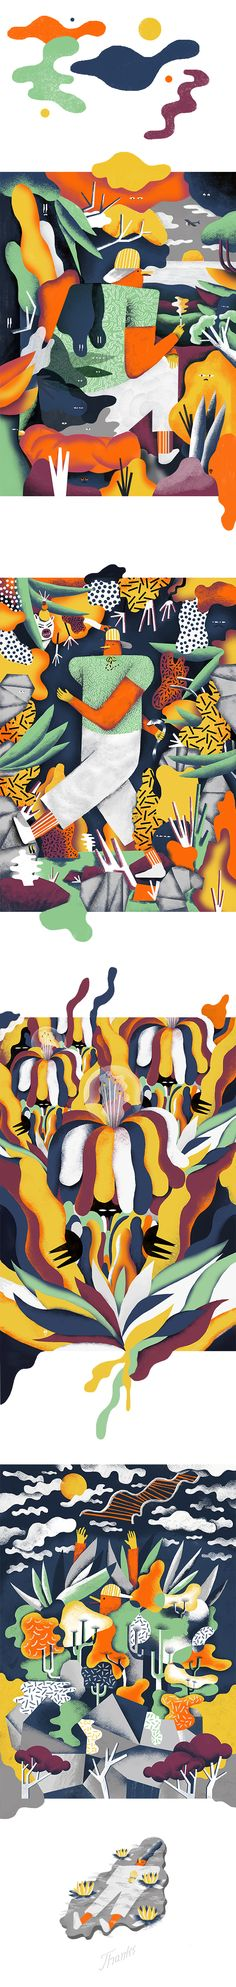 Short story about Tim, by Poland illustrator, Karol Banach Illustration Story, Character Illustration, Graphic Design Illustration, Textile Pattern Design, Arte Popular, Illustrations And Posters, Graphic Design Typography, Designs To Draw, Easy Drawings